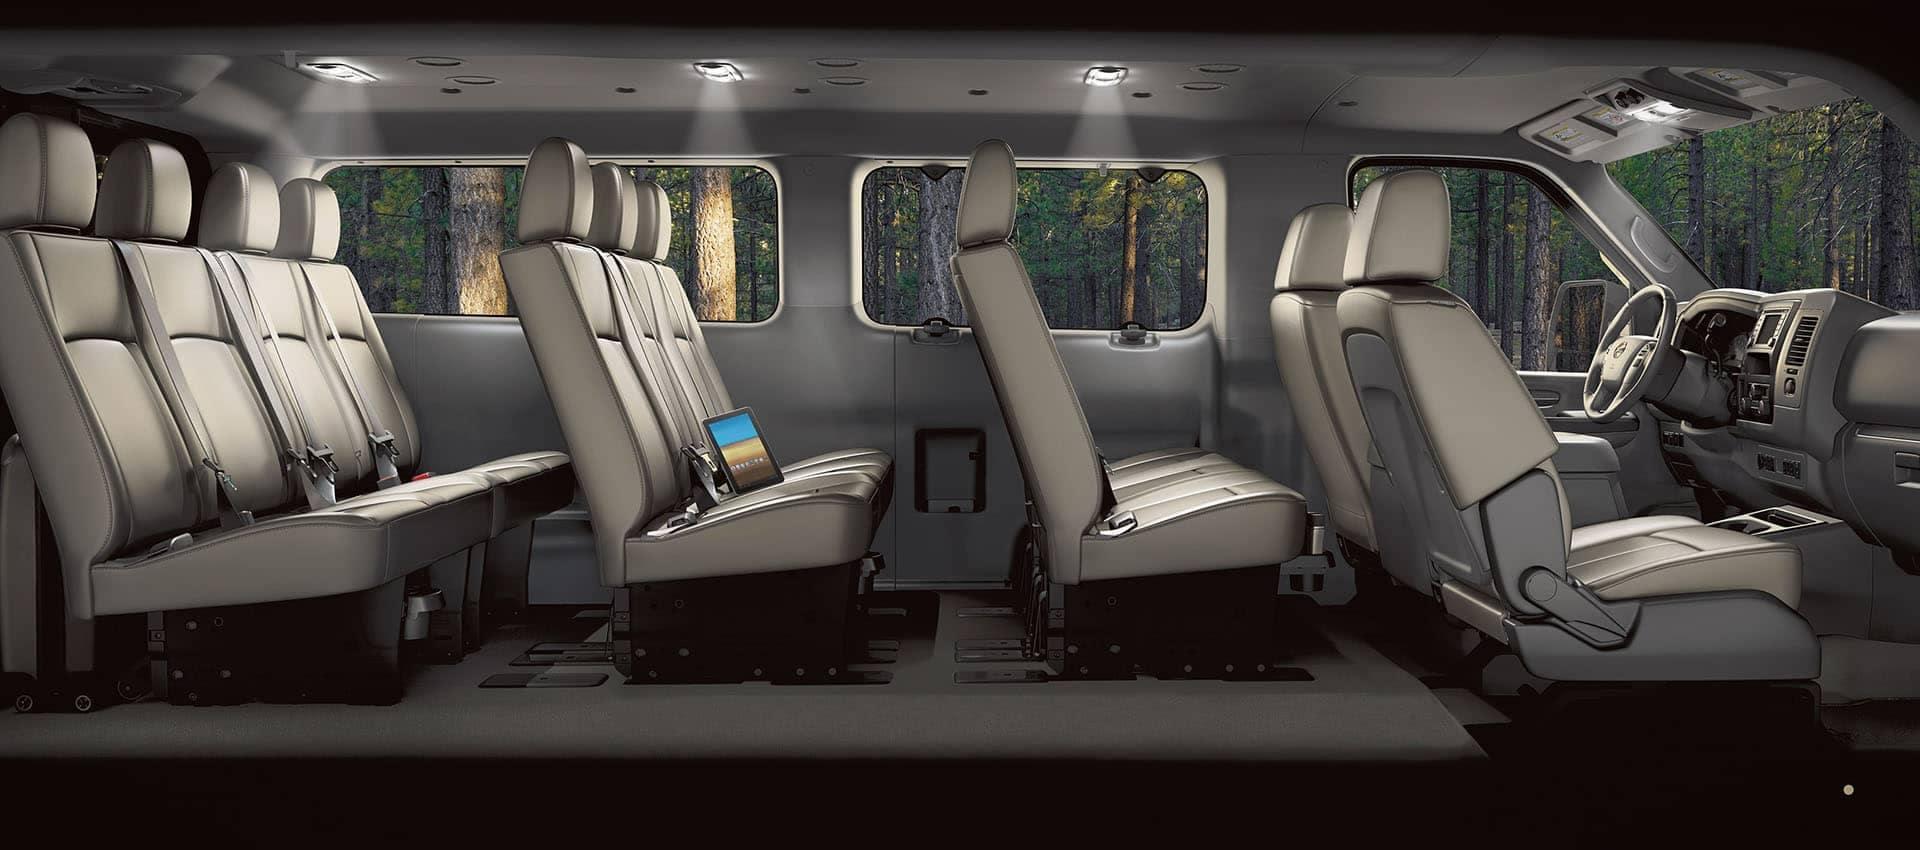 2020 Nissan NV Passenger interior showing 12 seats